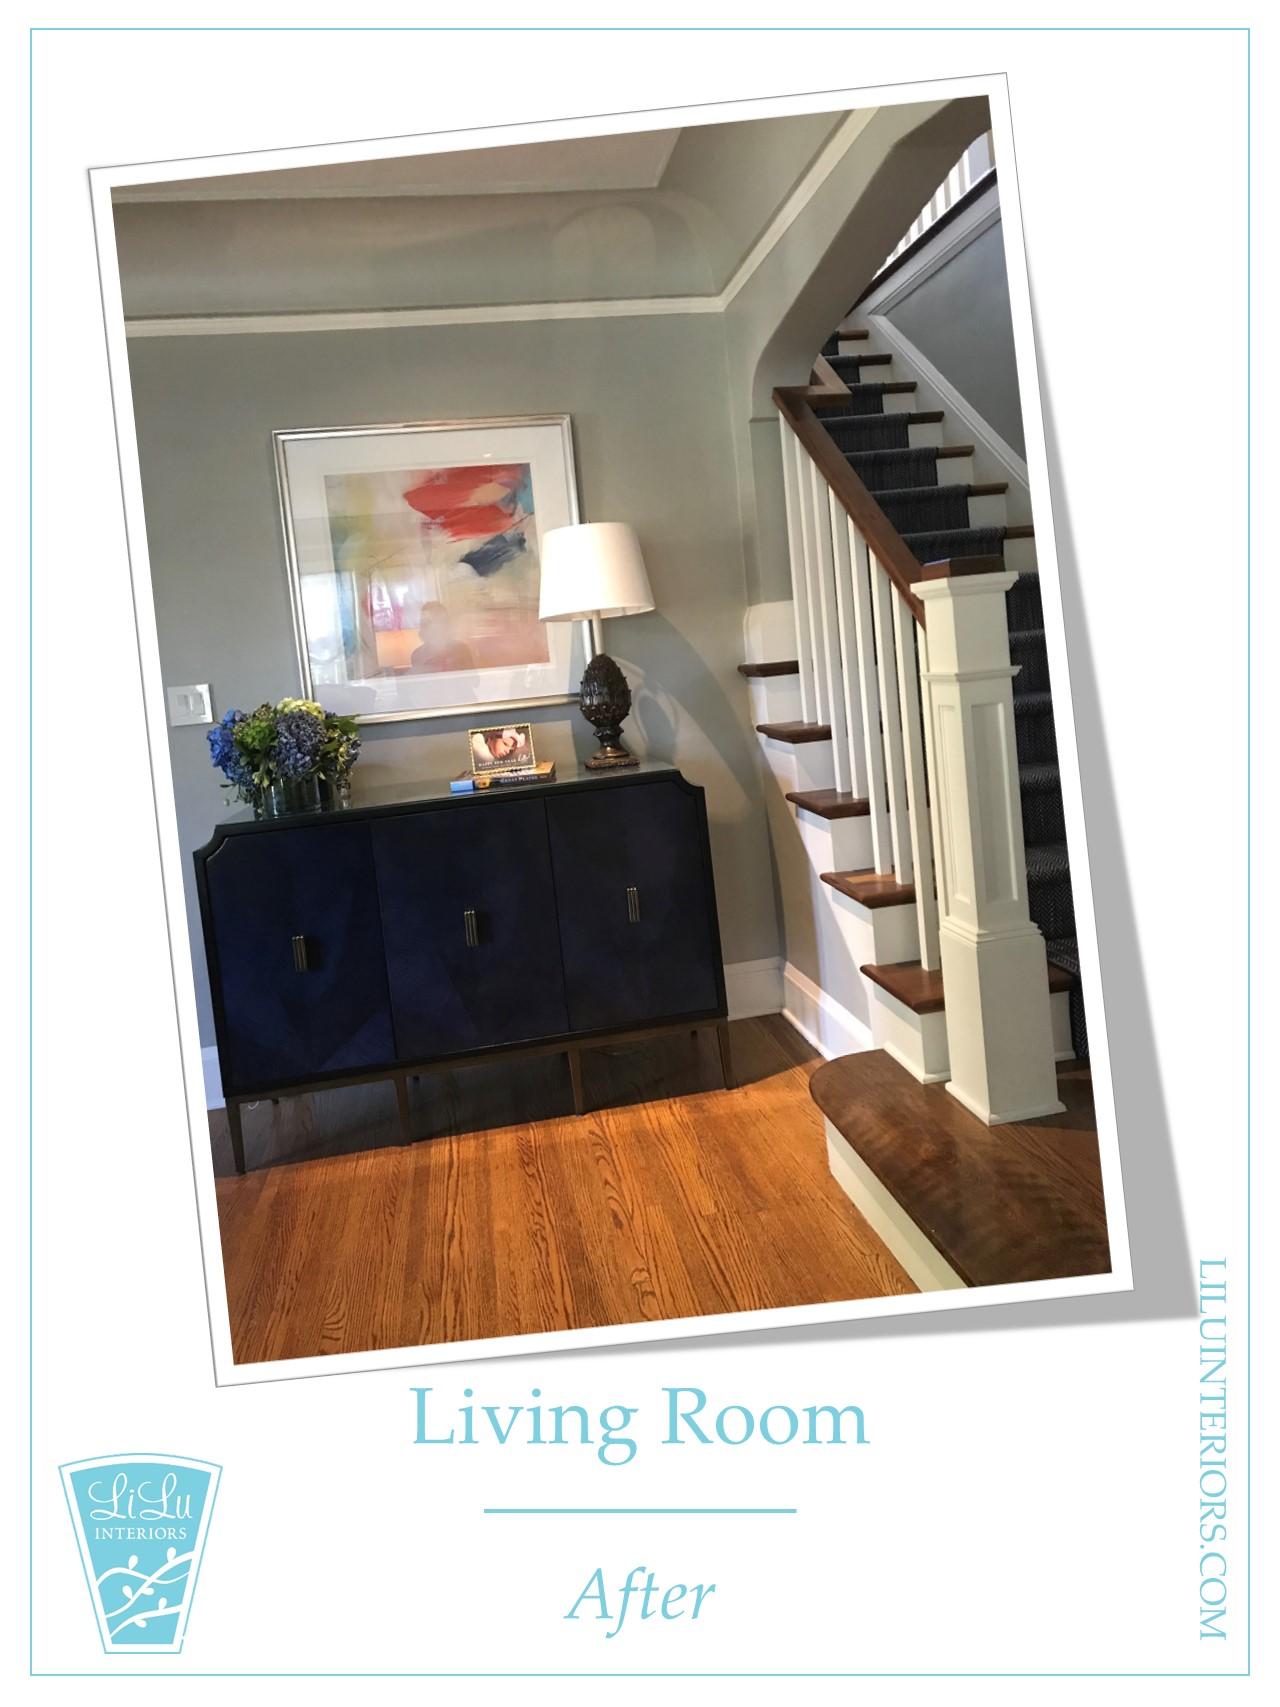 Arizona-remodel-kitchen-Minneapolis-interior-designer-55391.jpg